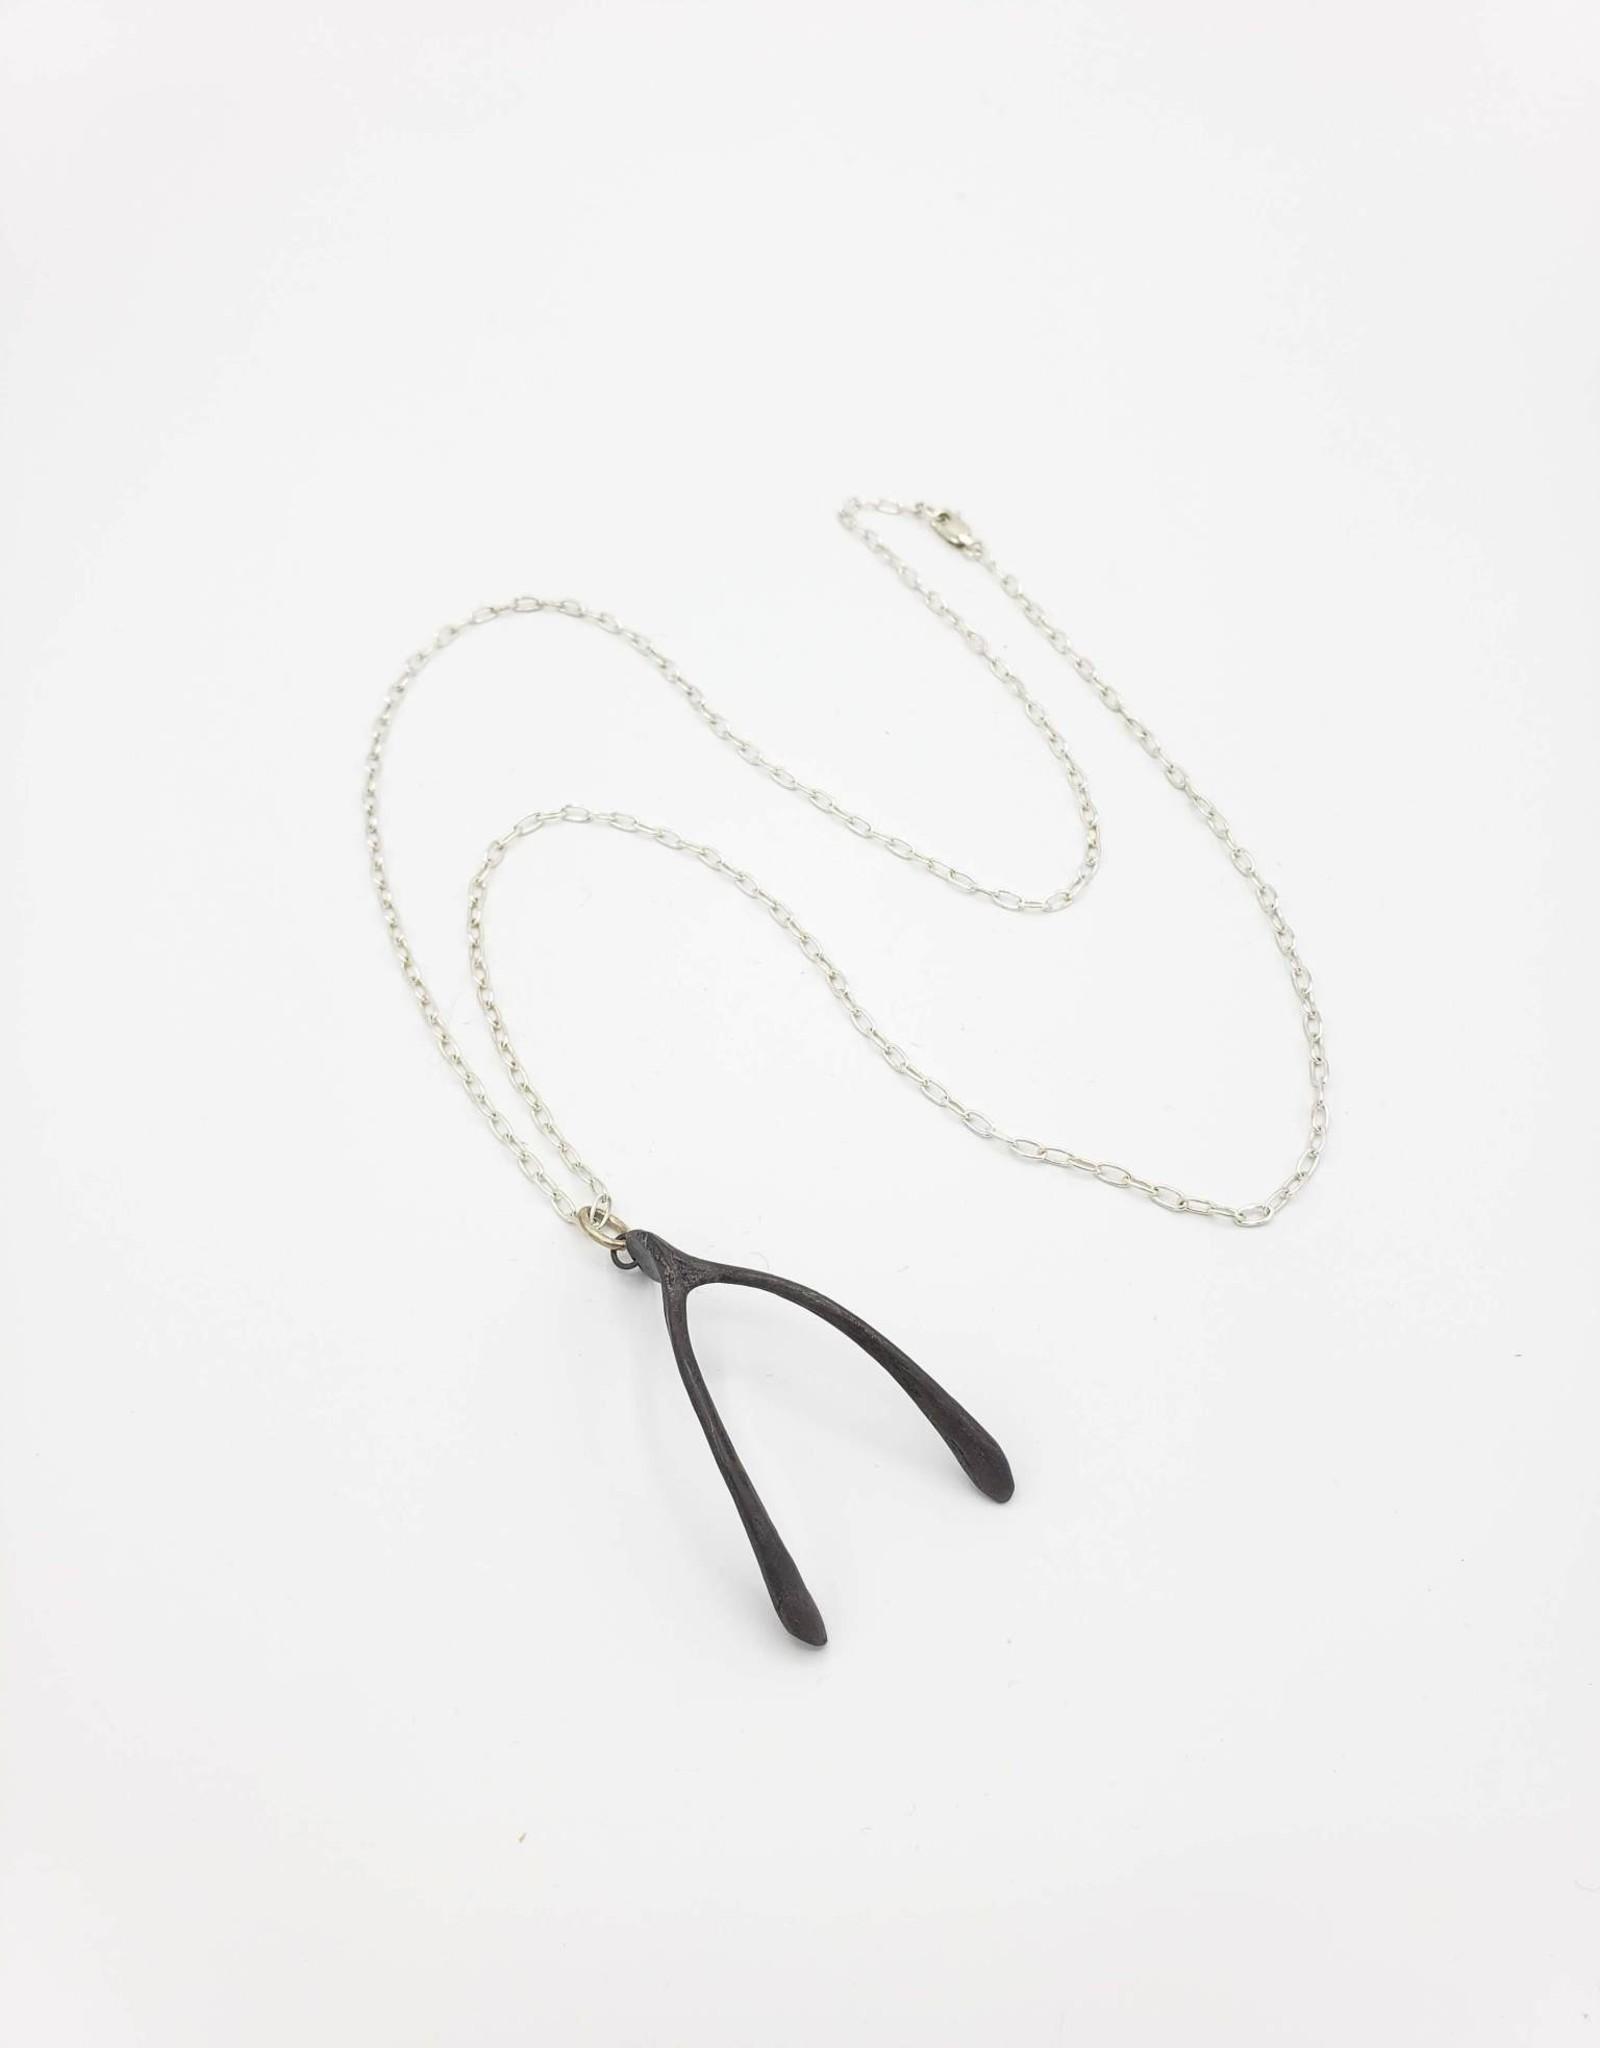 Redux Wishbone pendant cast in Oxidized Sterling Silver